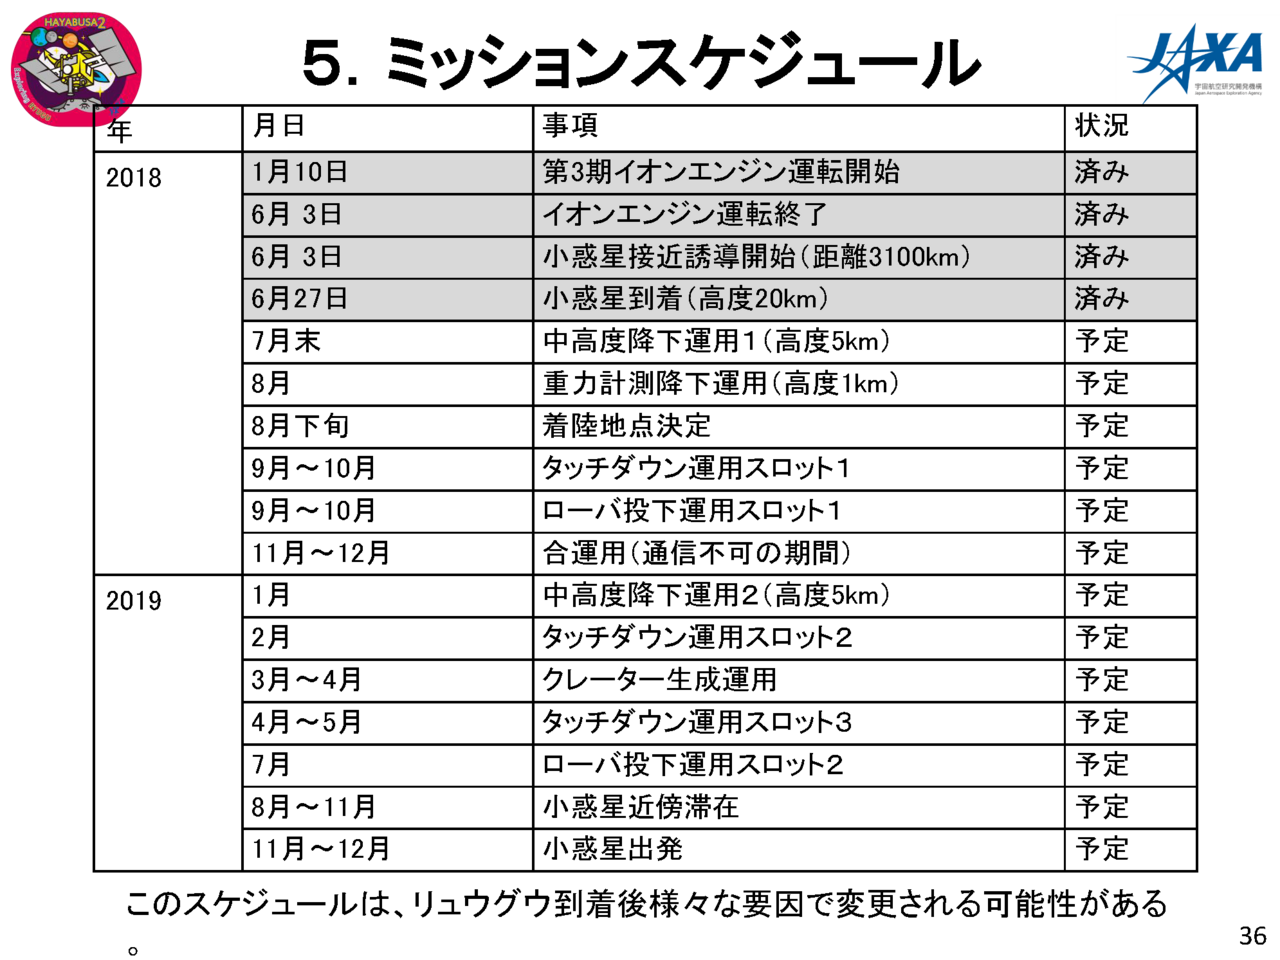 f:id:Imamura:20180719131731p:plain